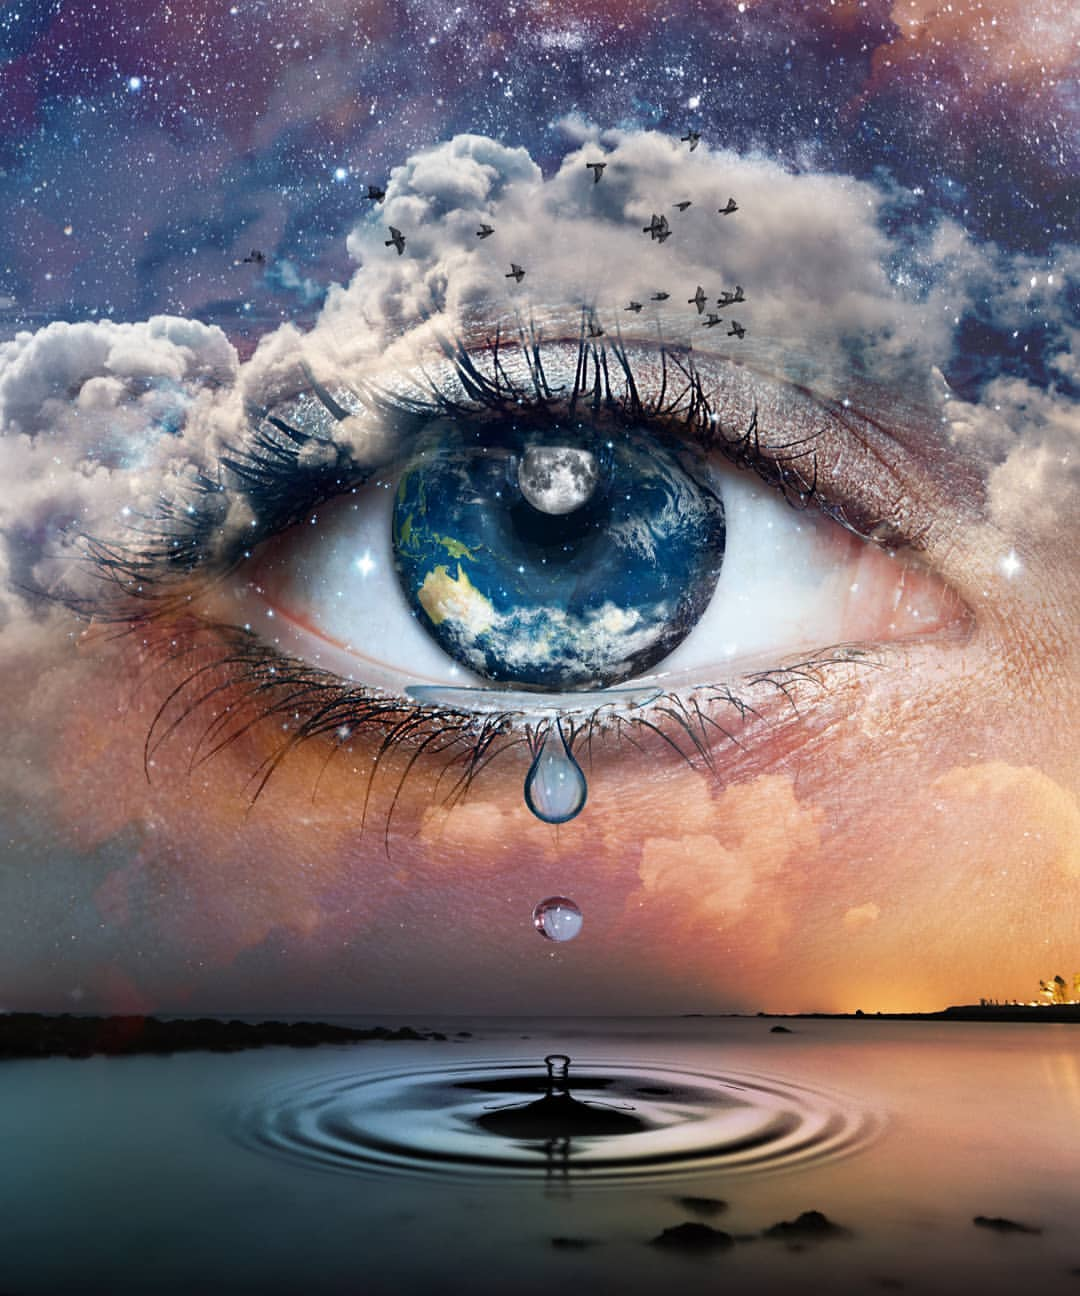 Фото Глаз девушки - планета Земля со слезой и облаками над ним, by skip_closer